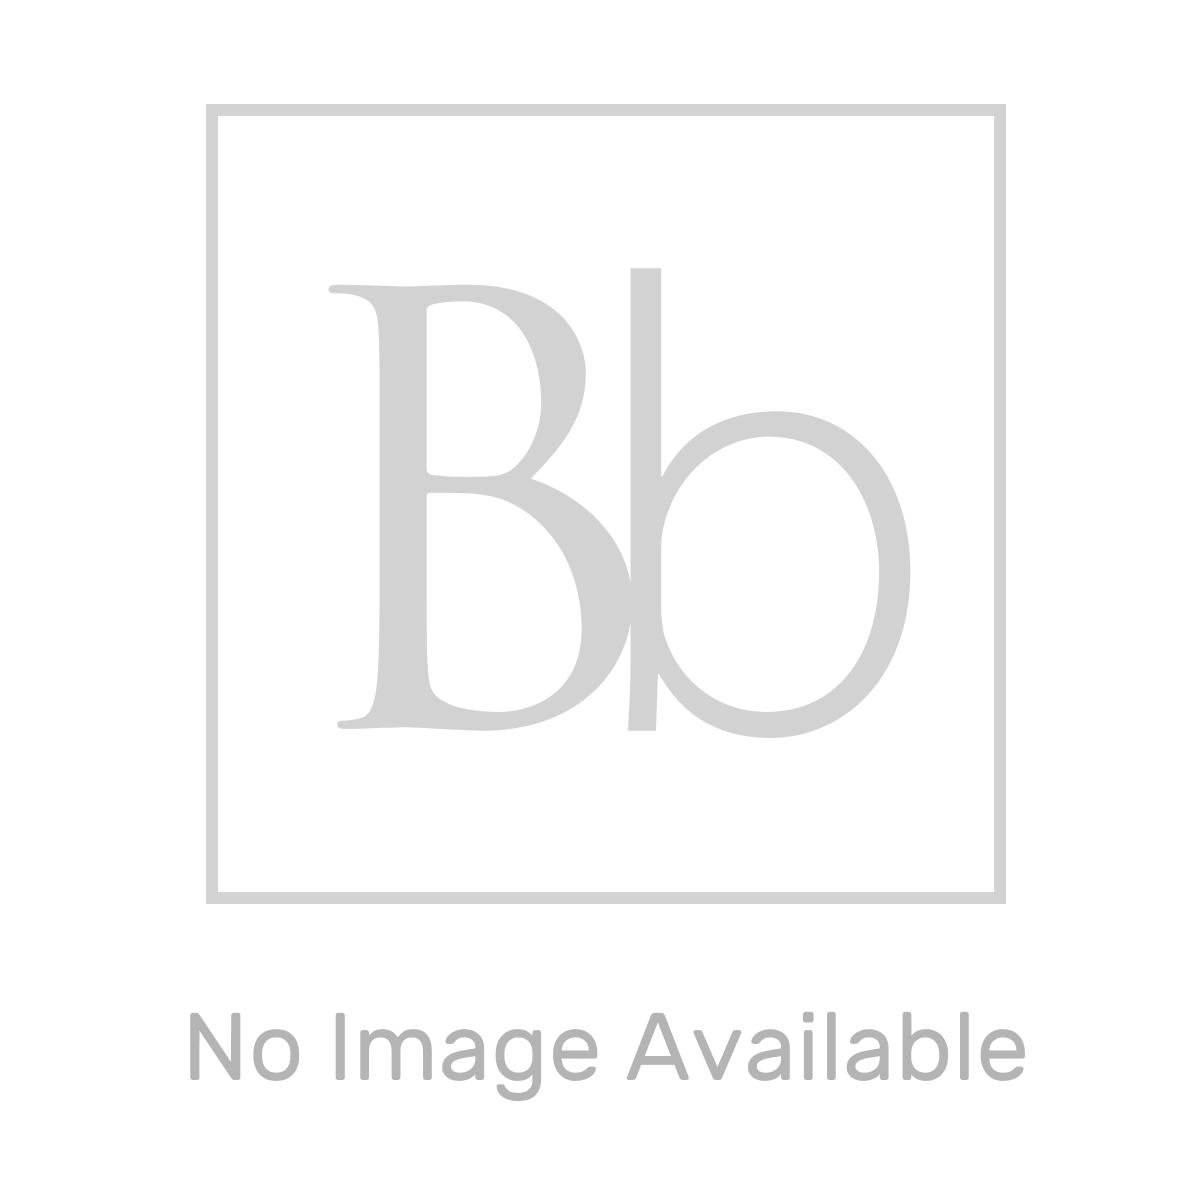 RAK Surface Cool Grey Matt Tile 1200 x 1200mm Lifestyle